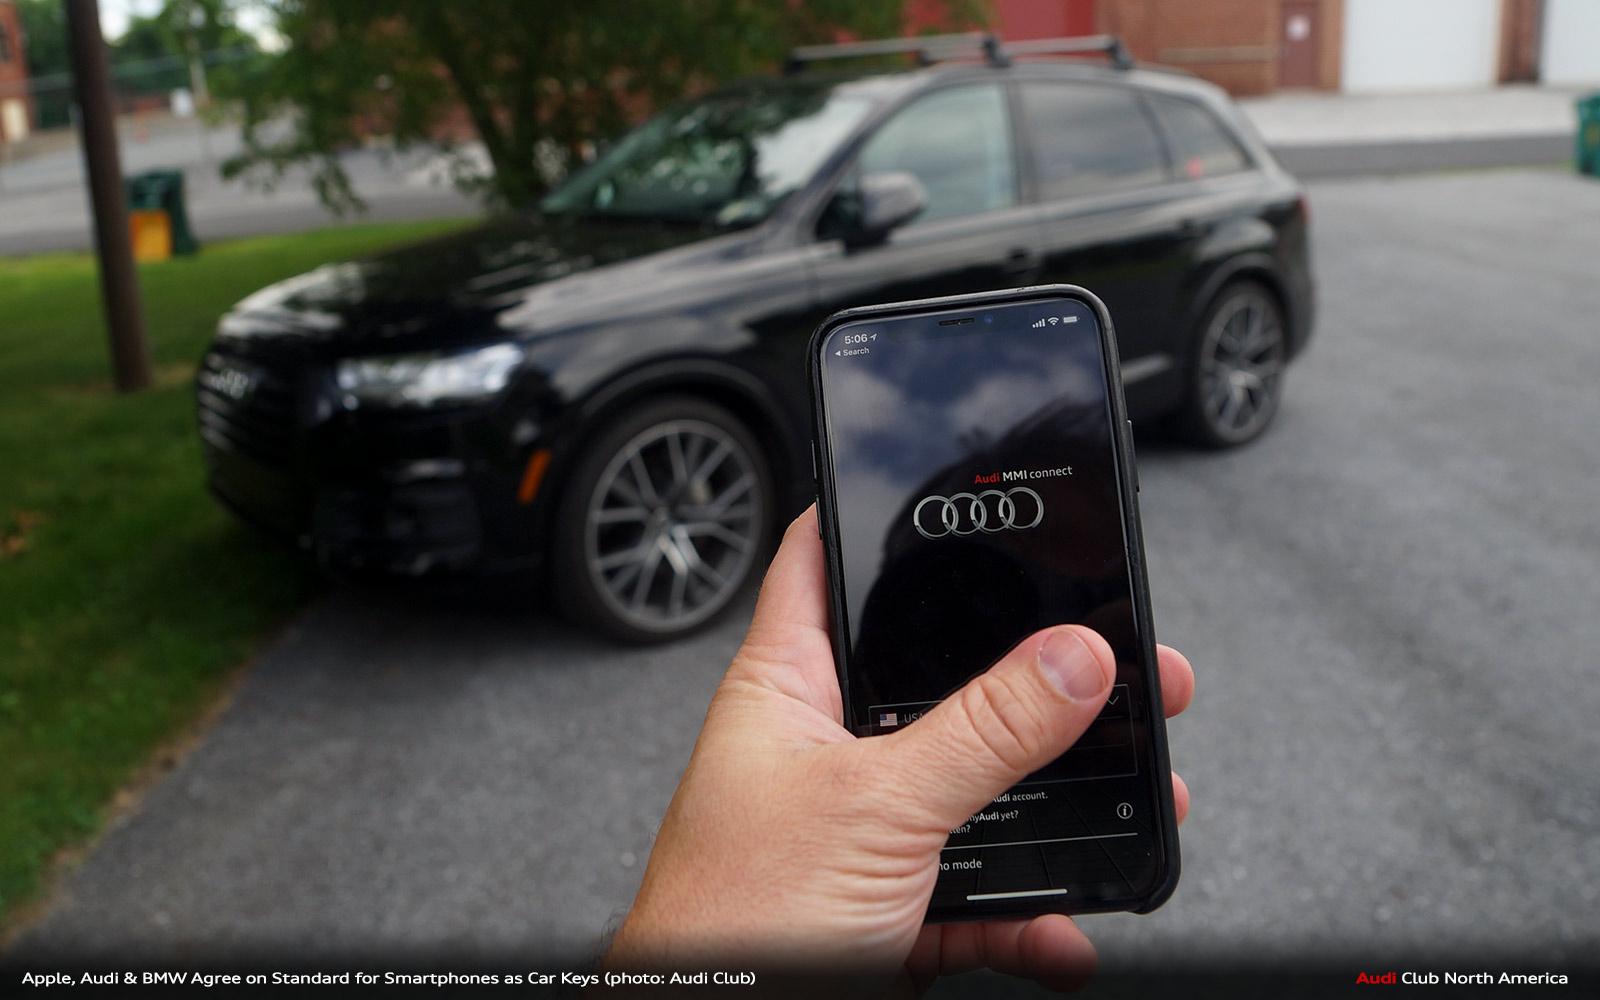 Audi, Apple, Samsung & More Agree to Standard for Smartphones as Keys